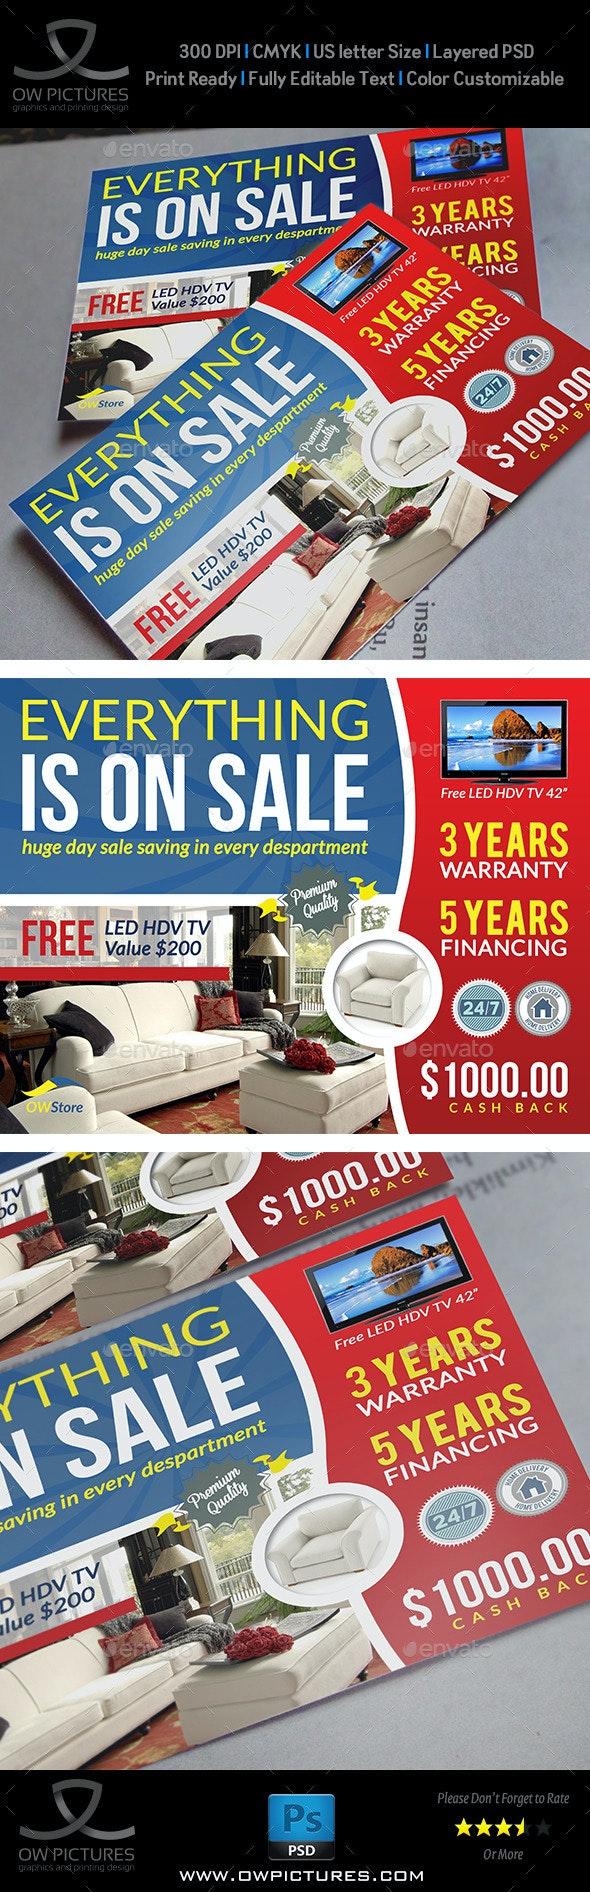 Sale Market Flyer Template - Commerce Flyers